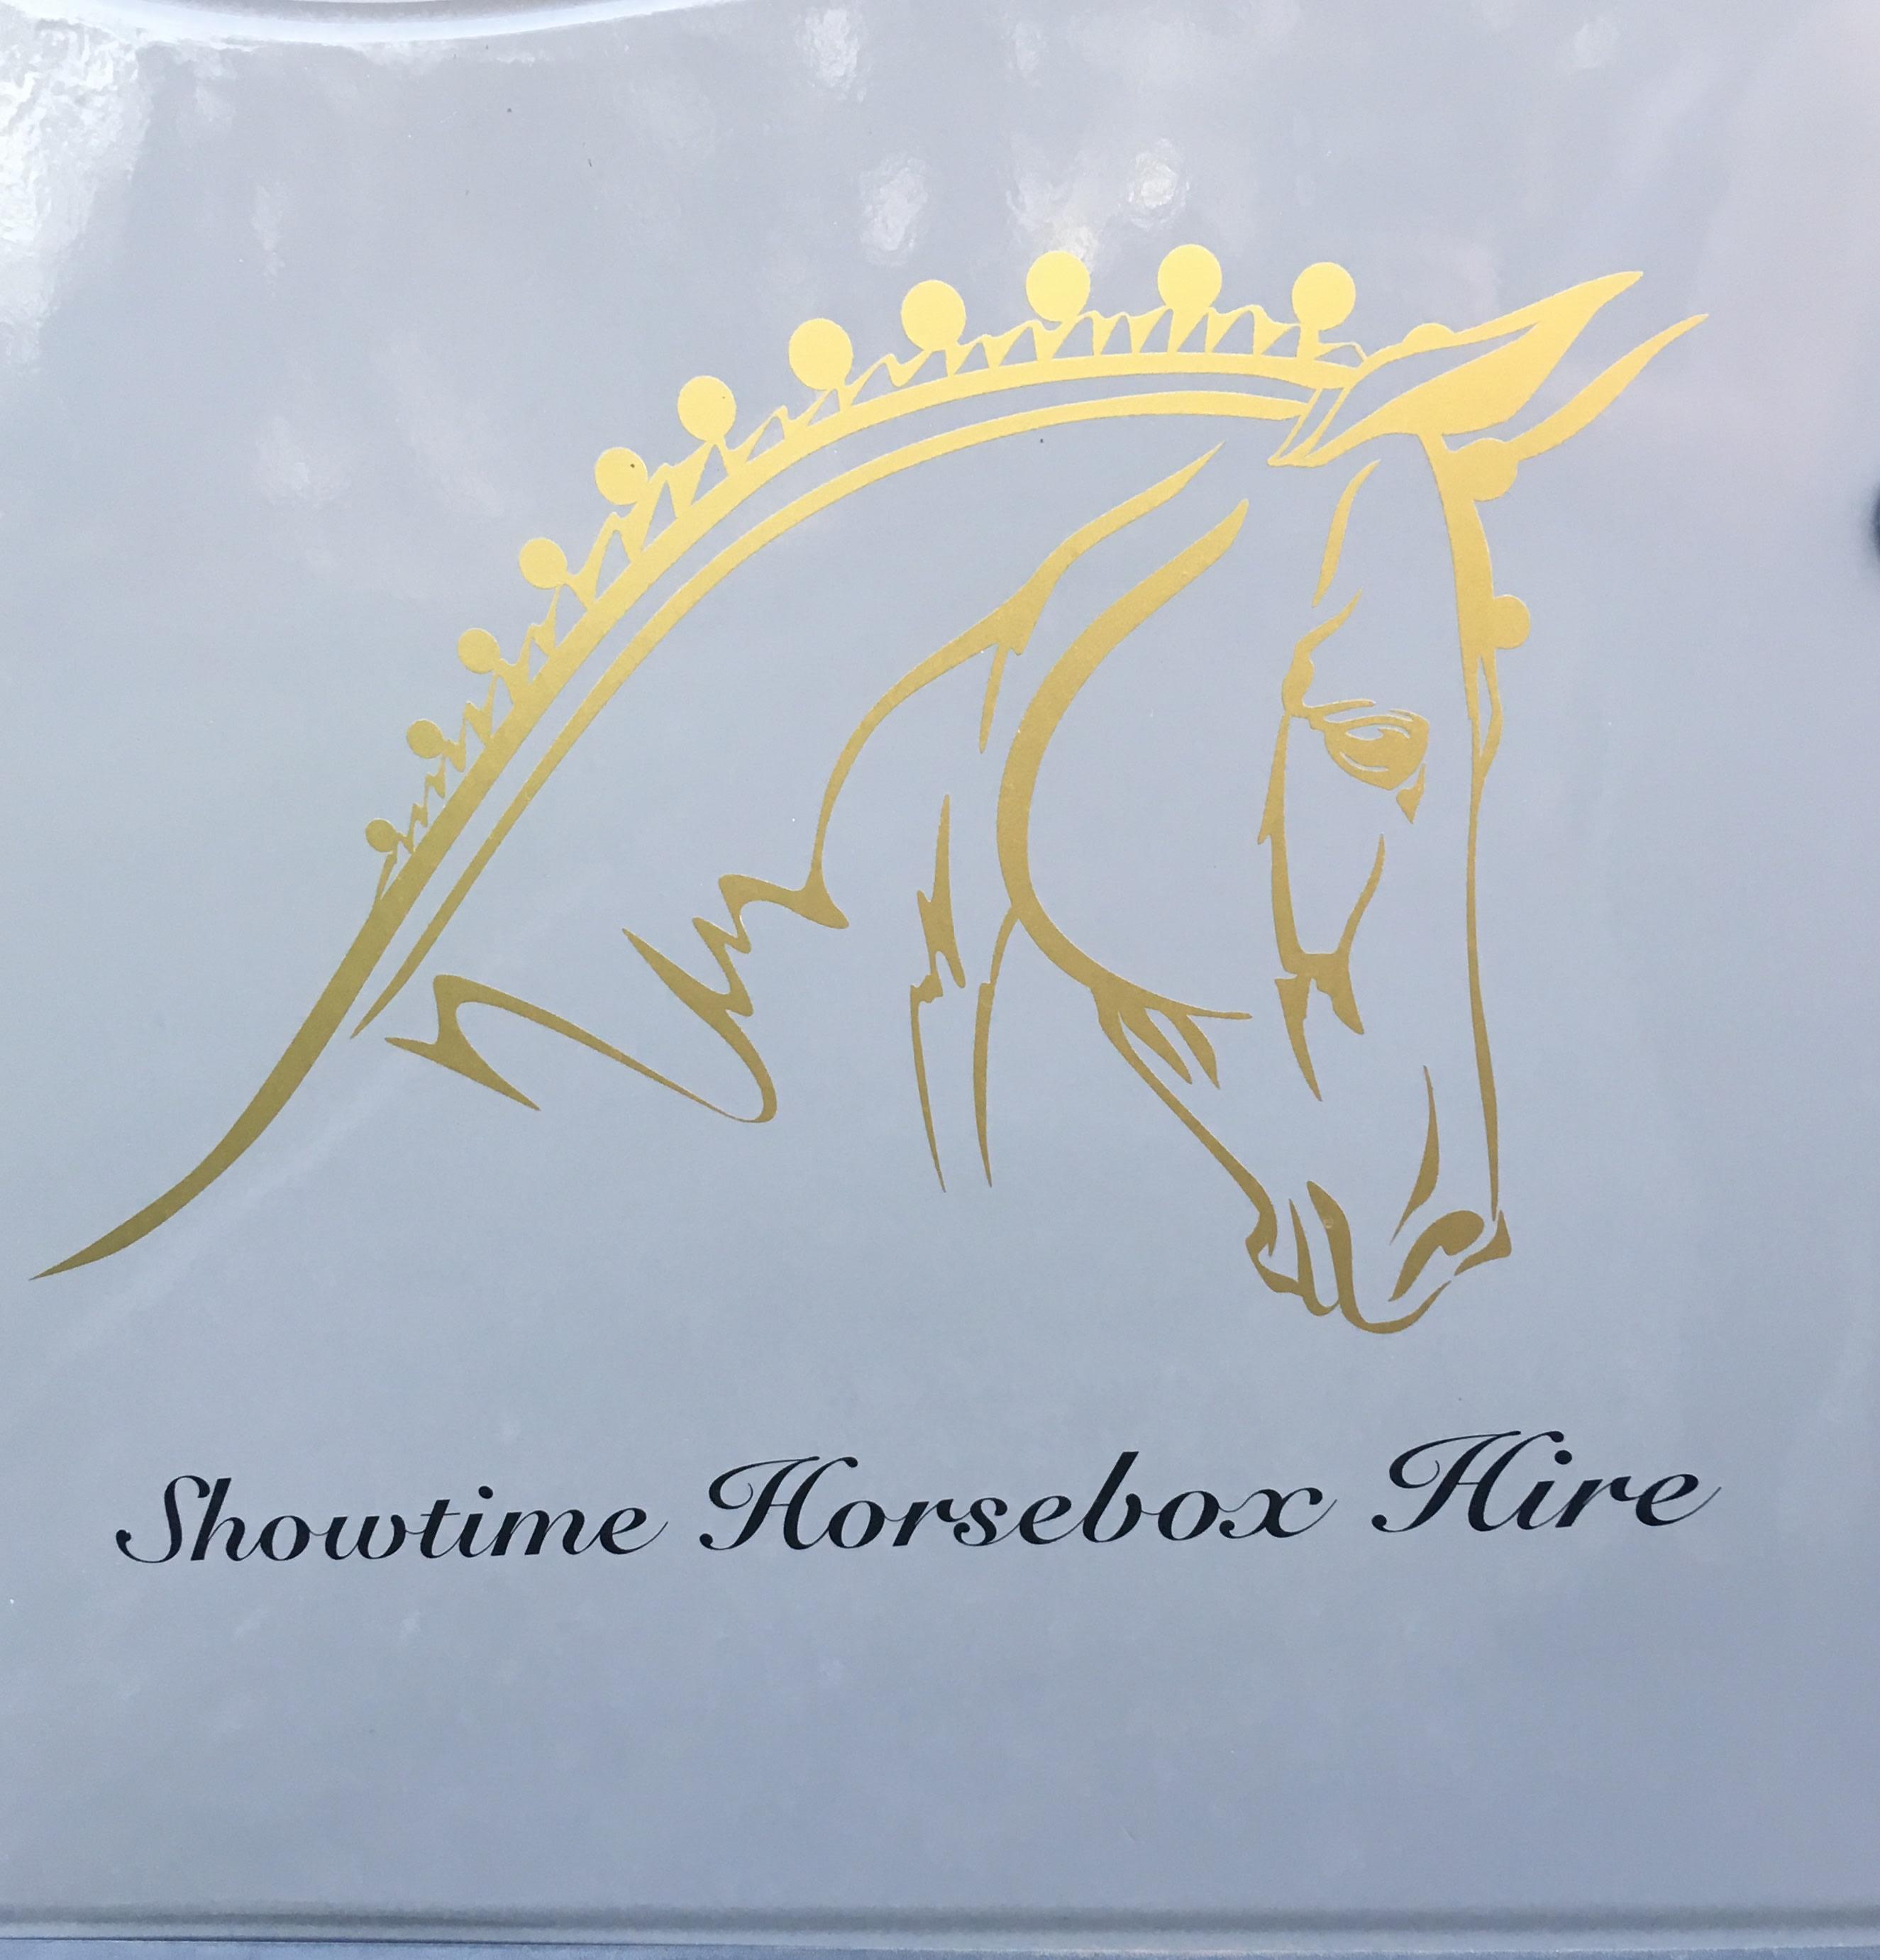 Showtime Horsebox Hire & Trailer Training